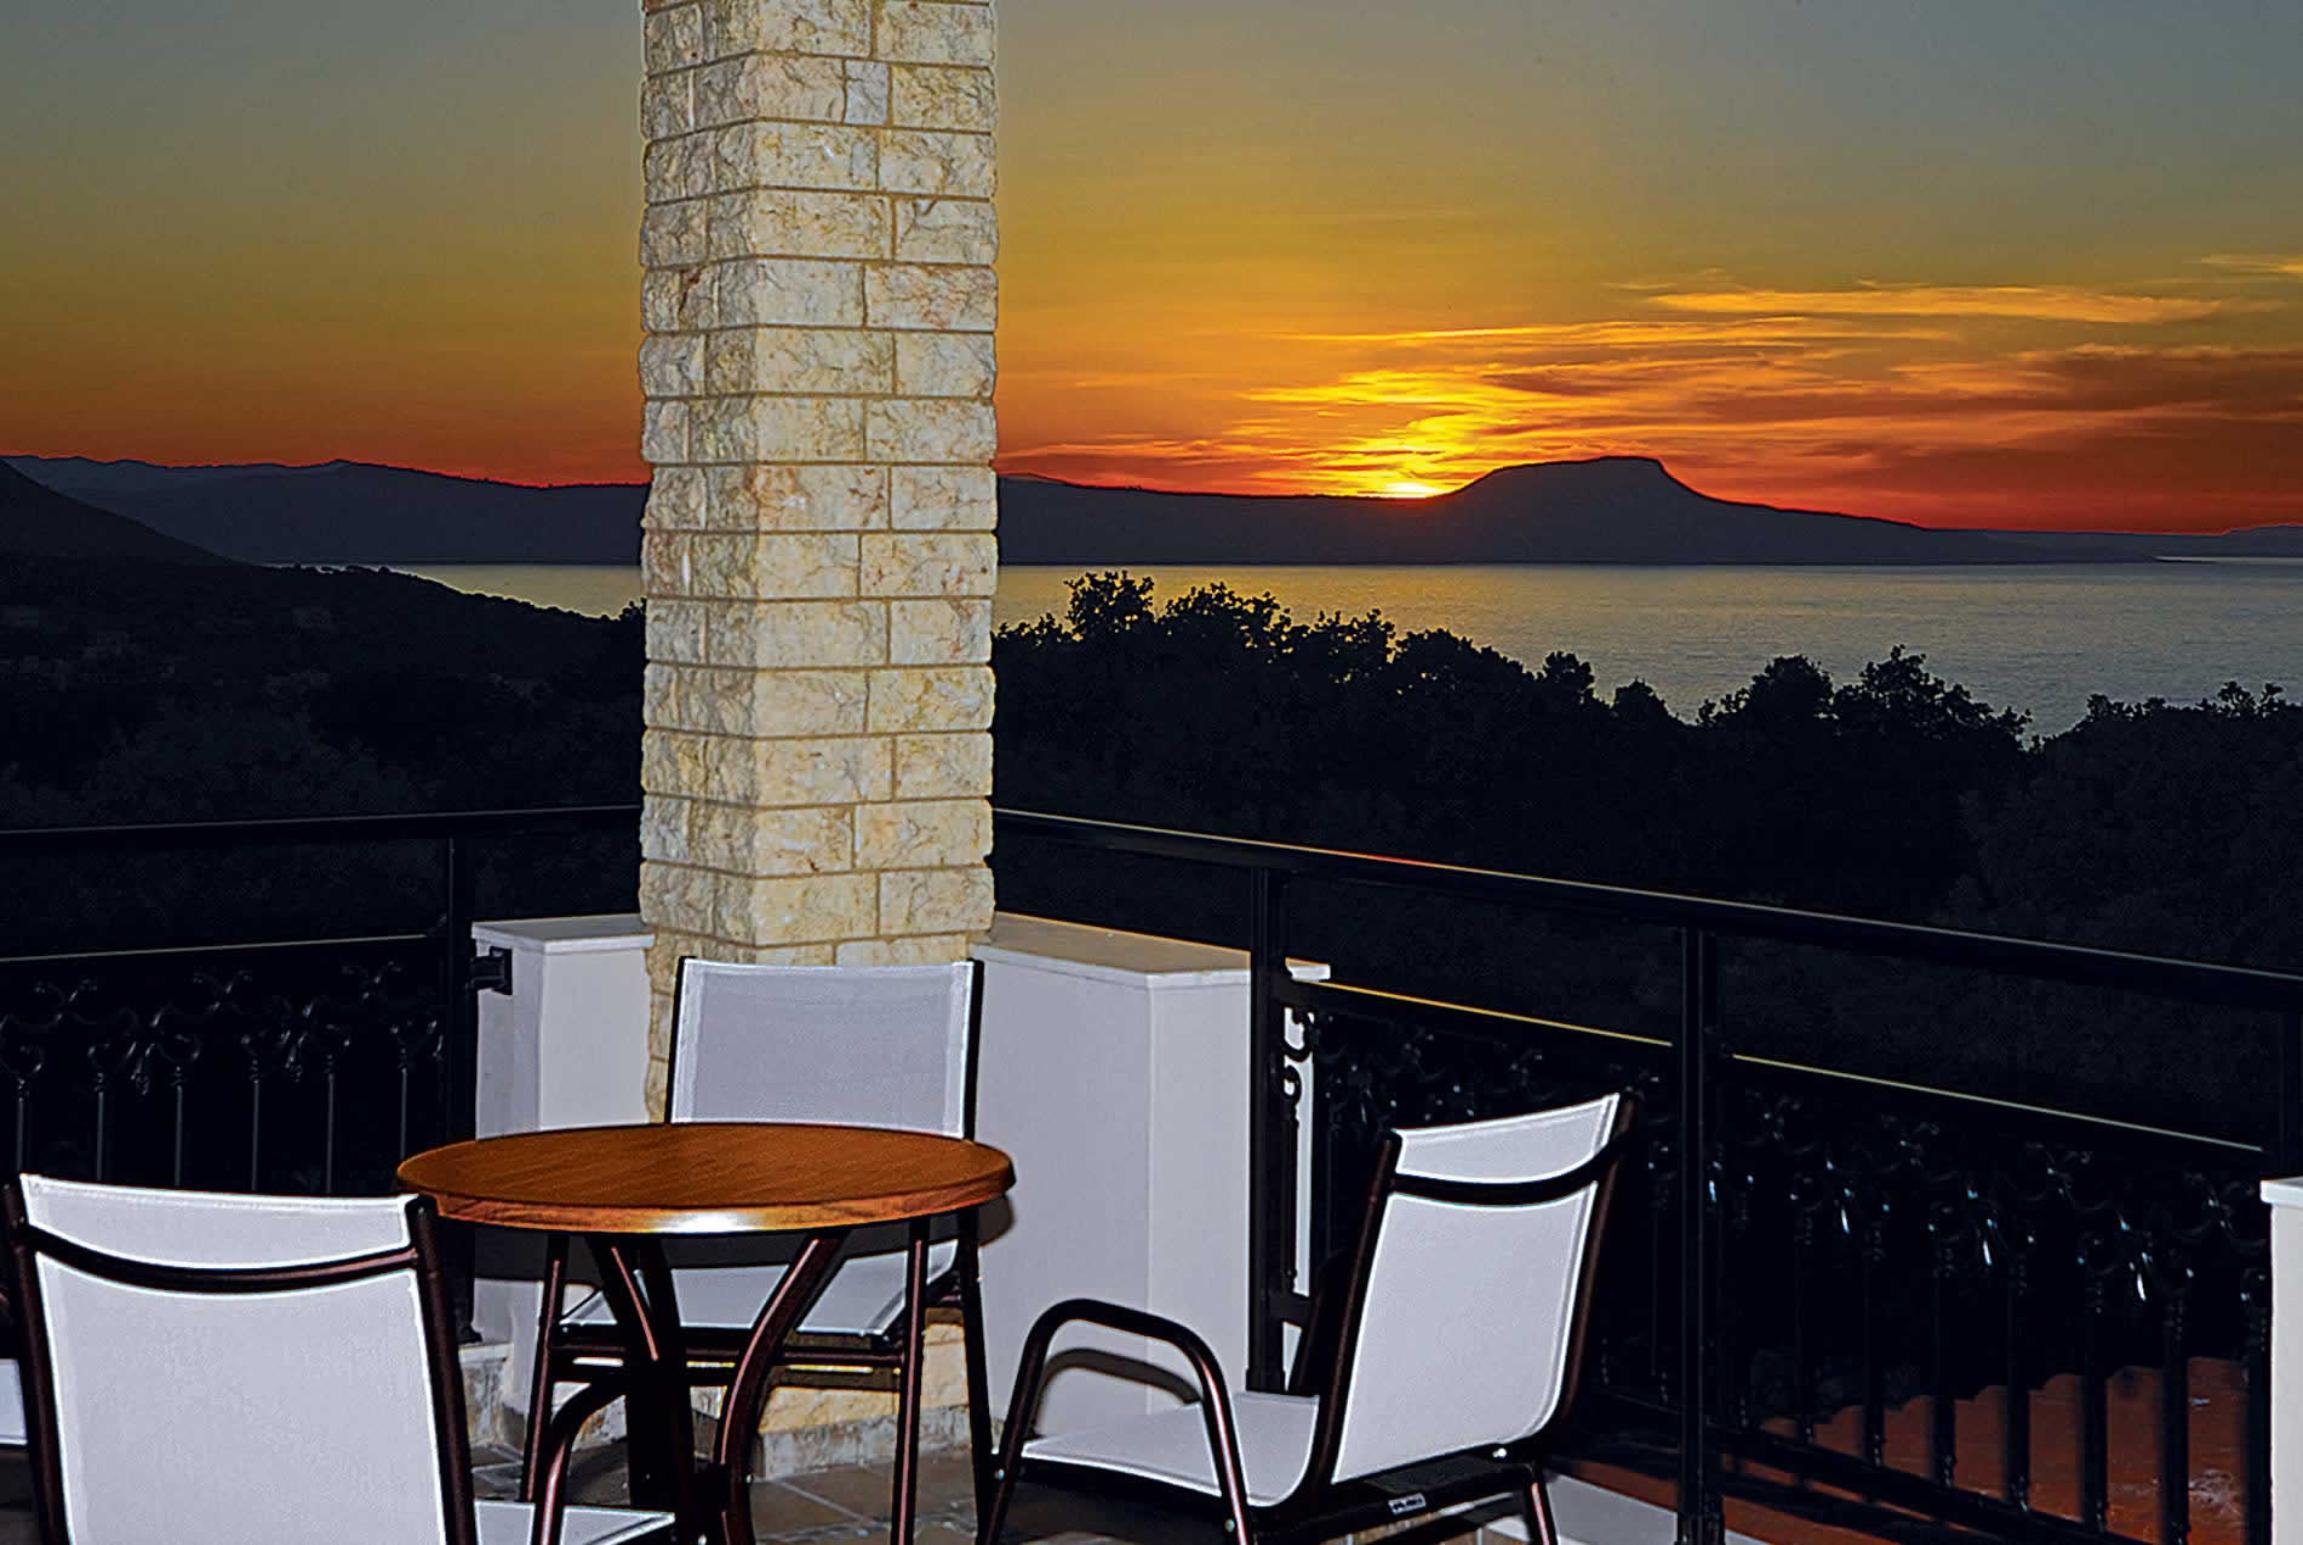 Ferienhaus Nefeli (2653931), Rethymno, Kreta Nordküste, Kreta, Griechenland, Bild 15